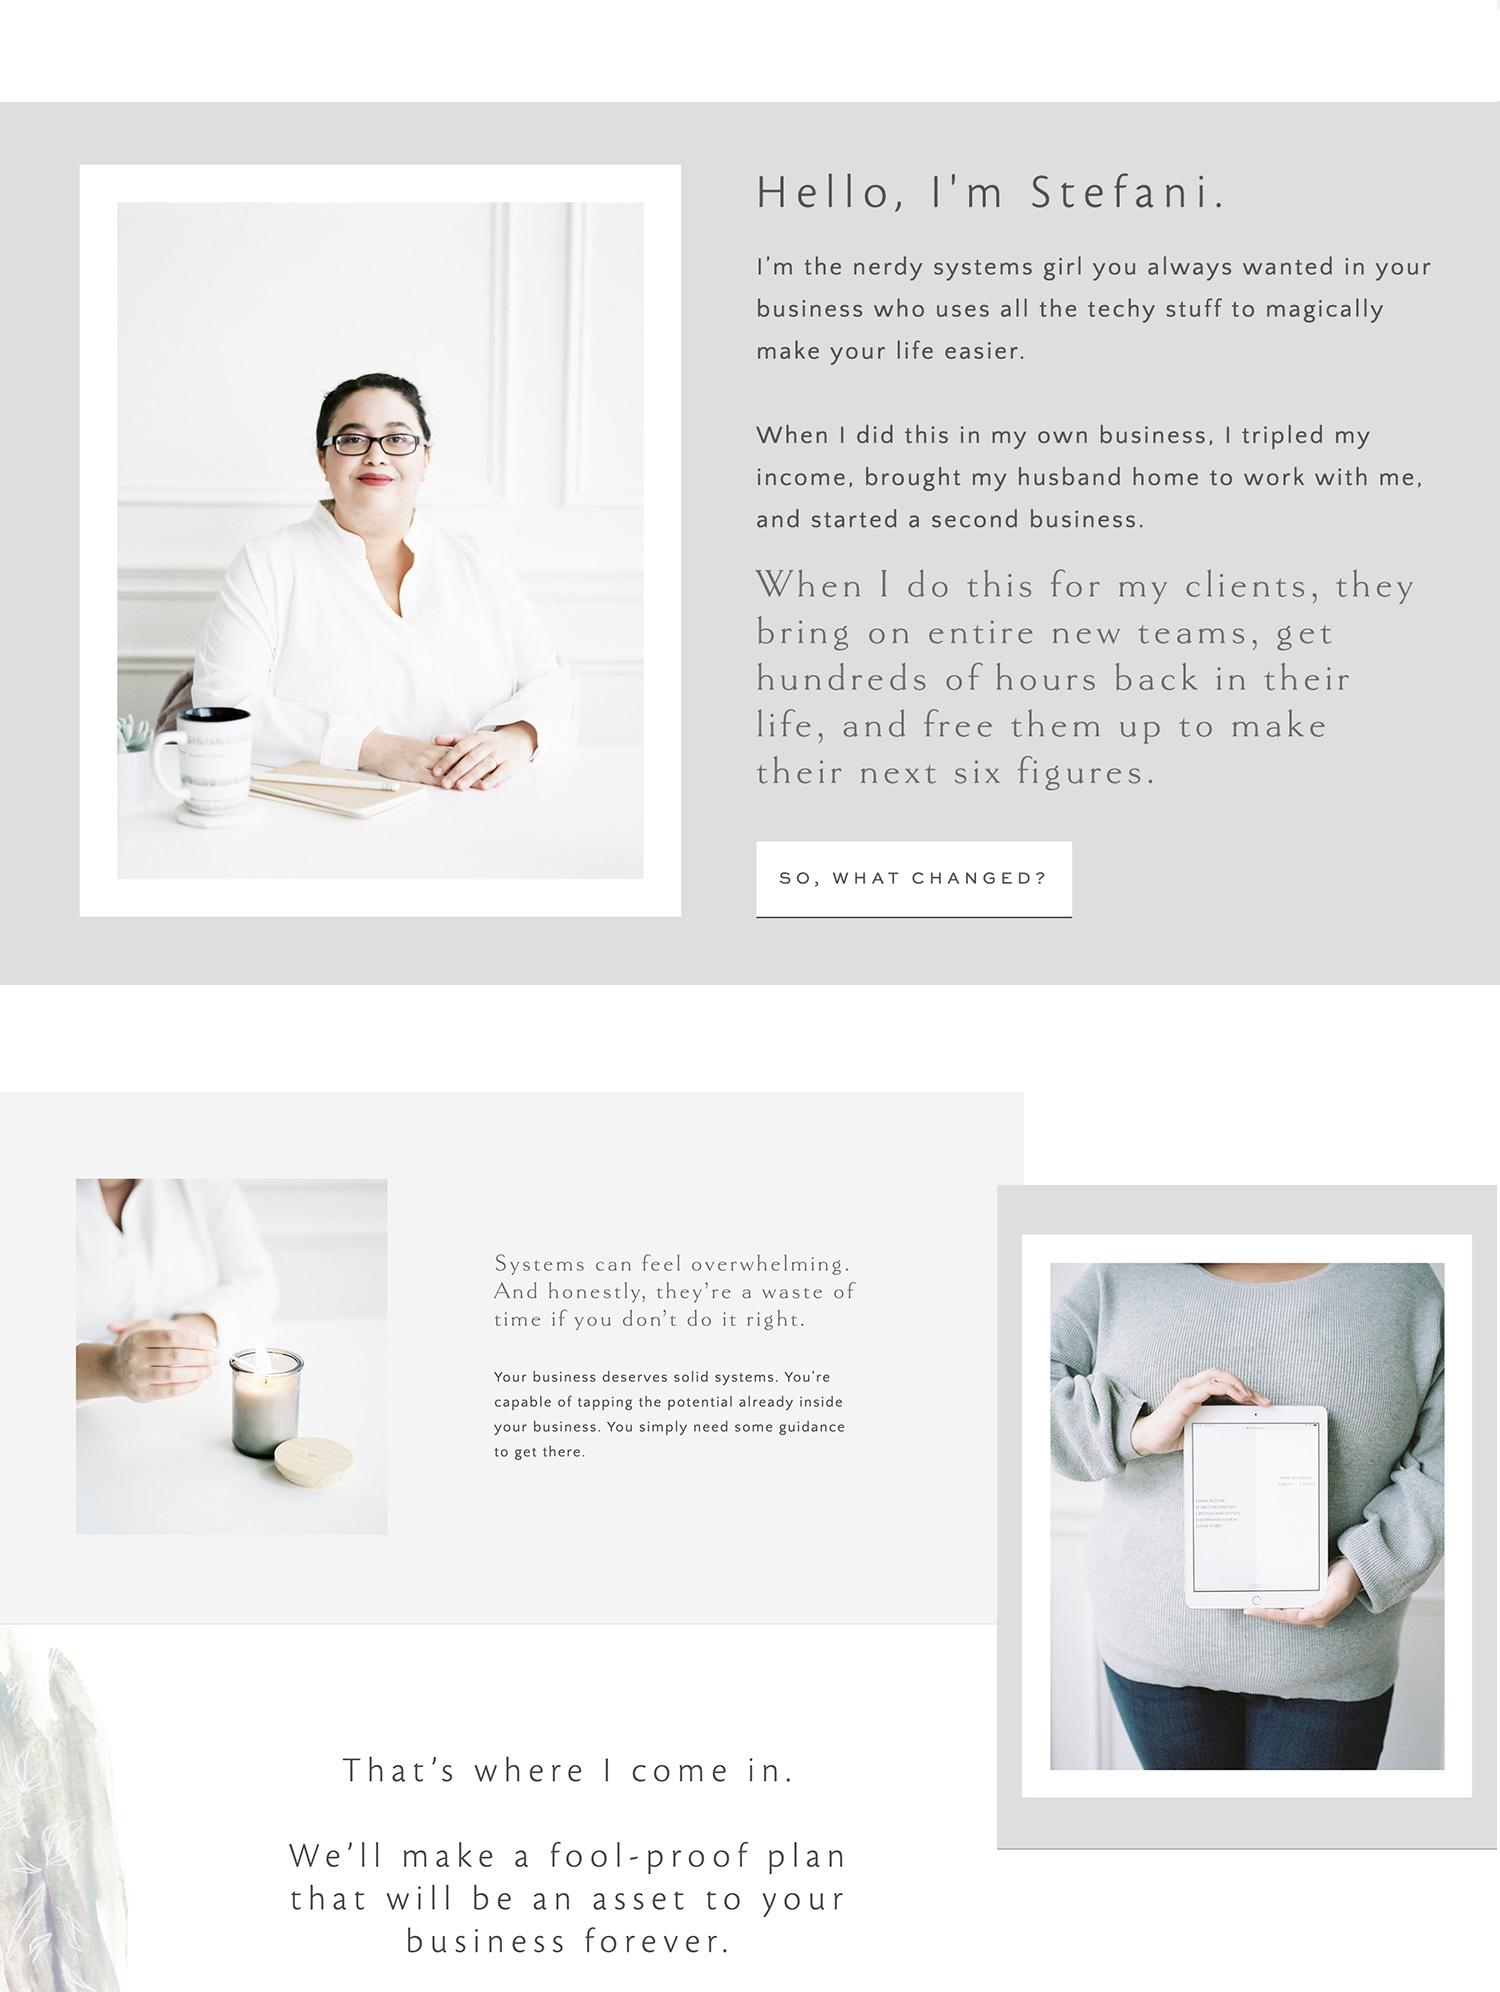 Michigan brand photographer Christina Harrison's film photography is seen on Stefani Jessica Studio's website